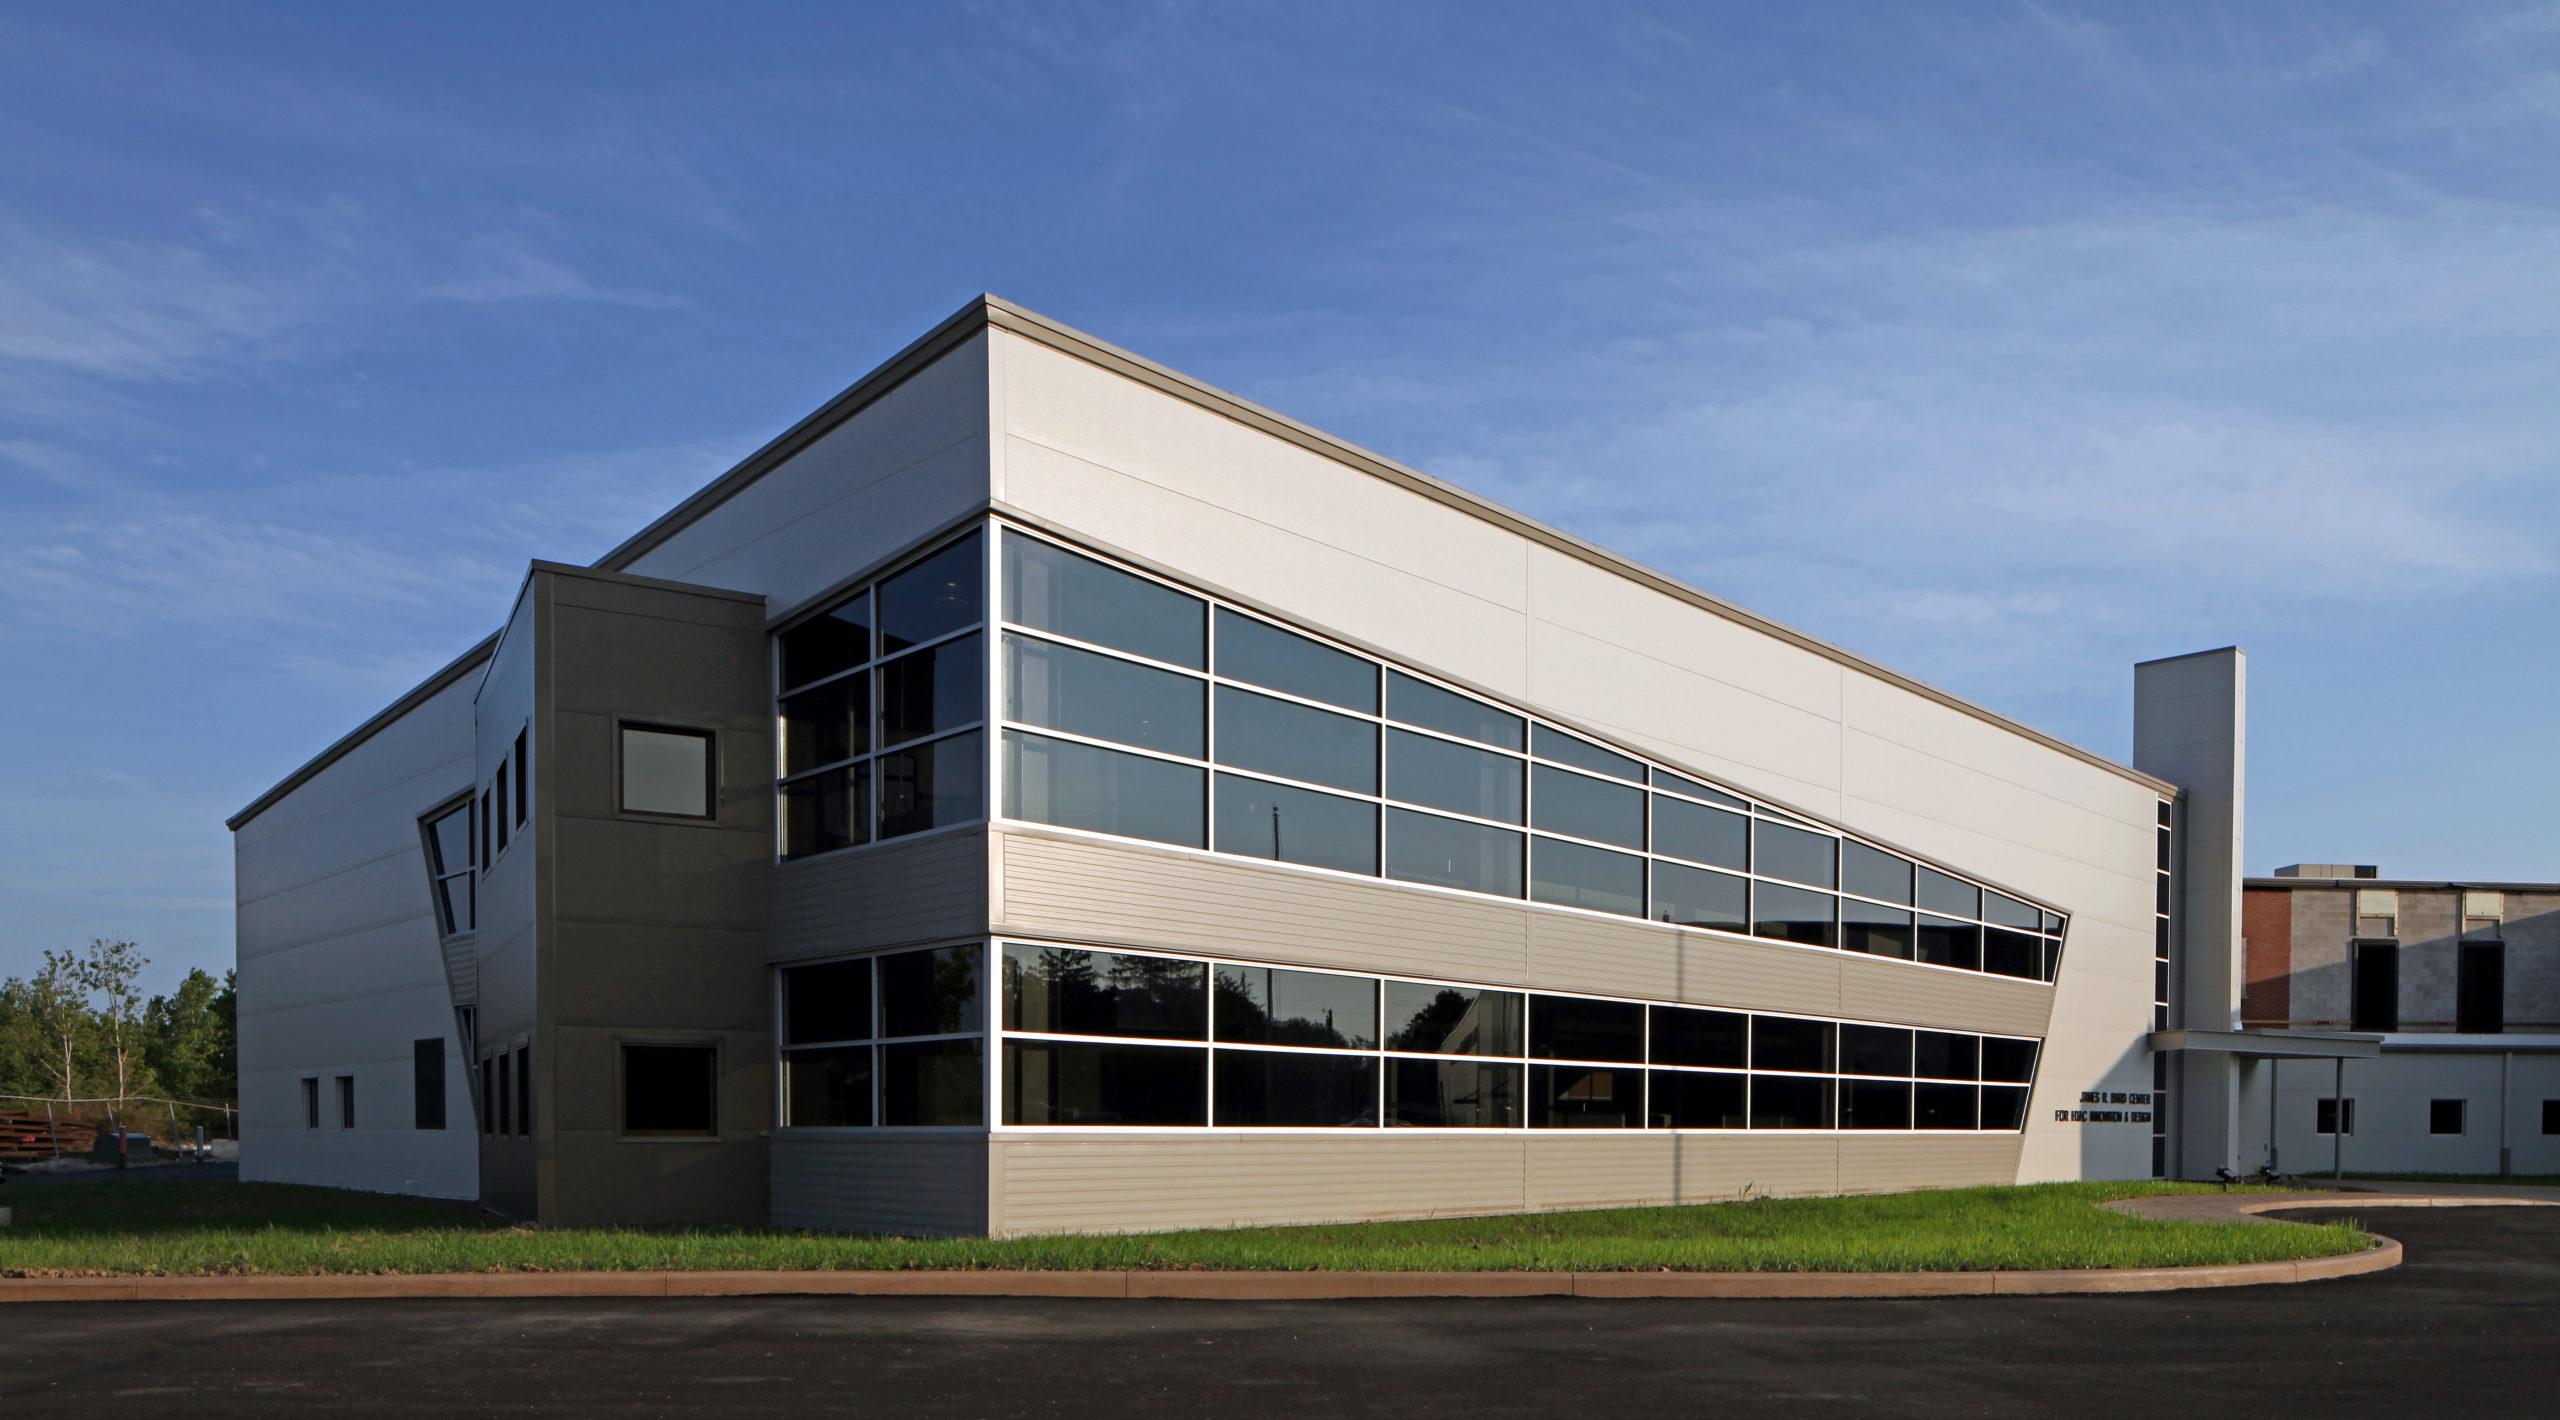 James R. Bard Center for HVAC Innovation & Design – Bryan, Ohio